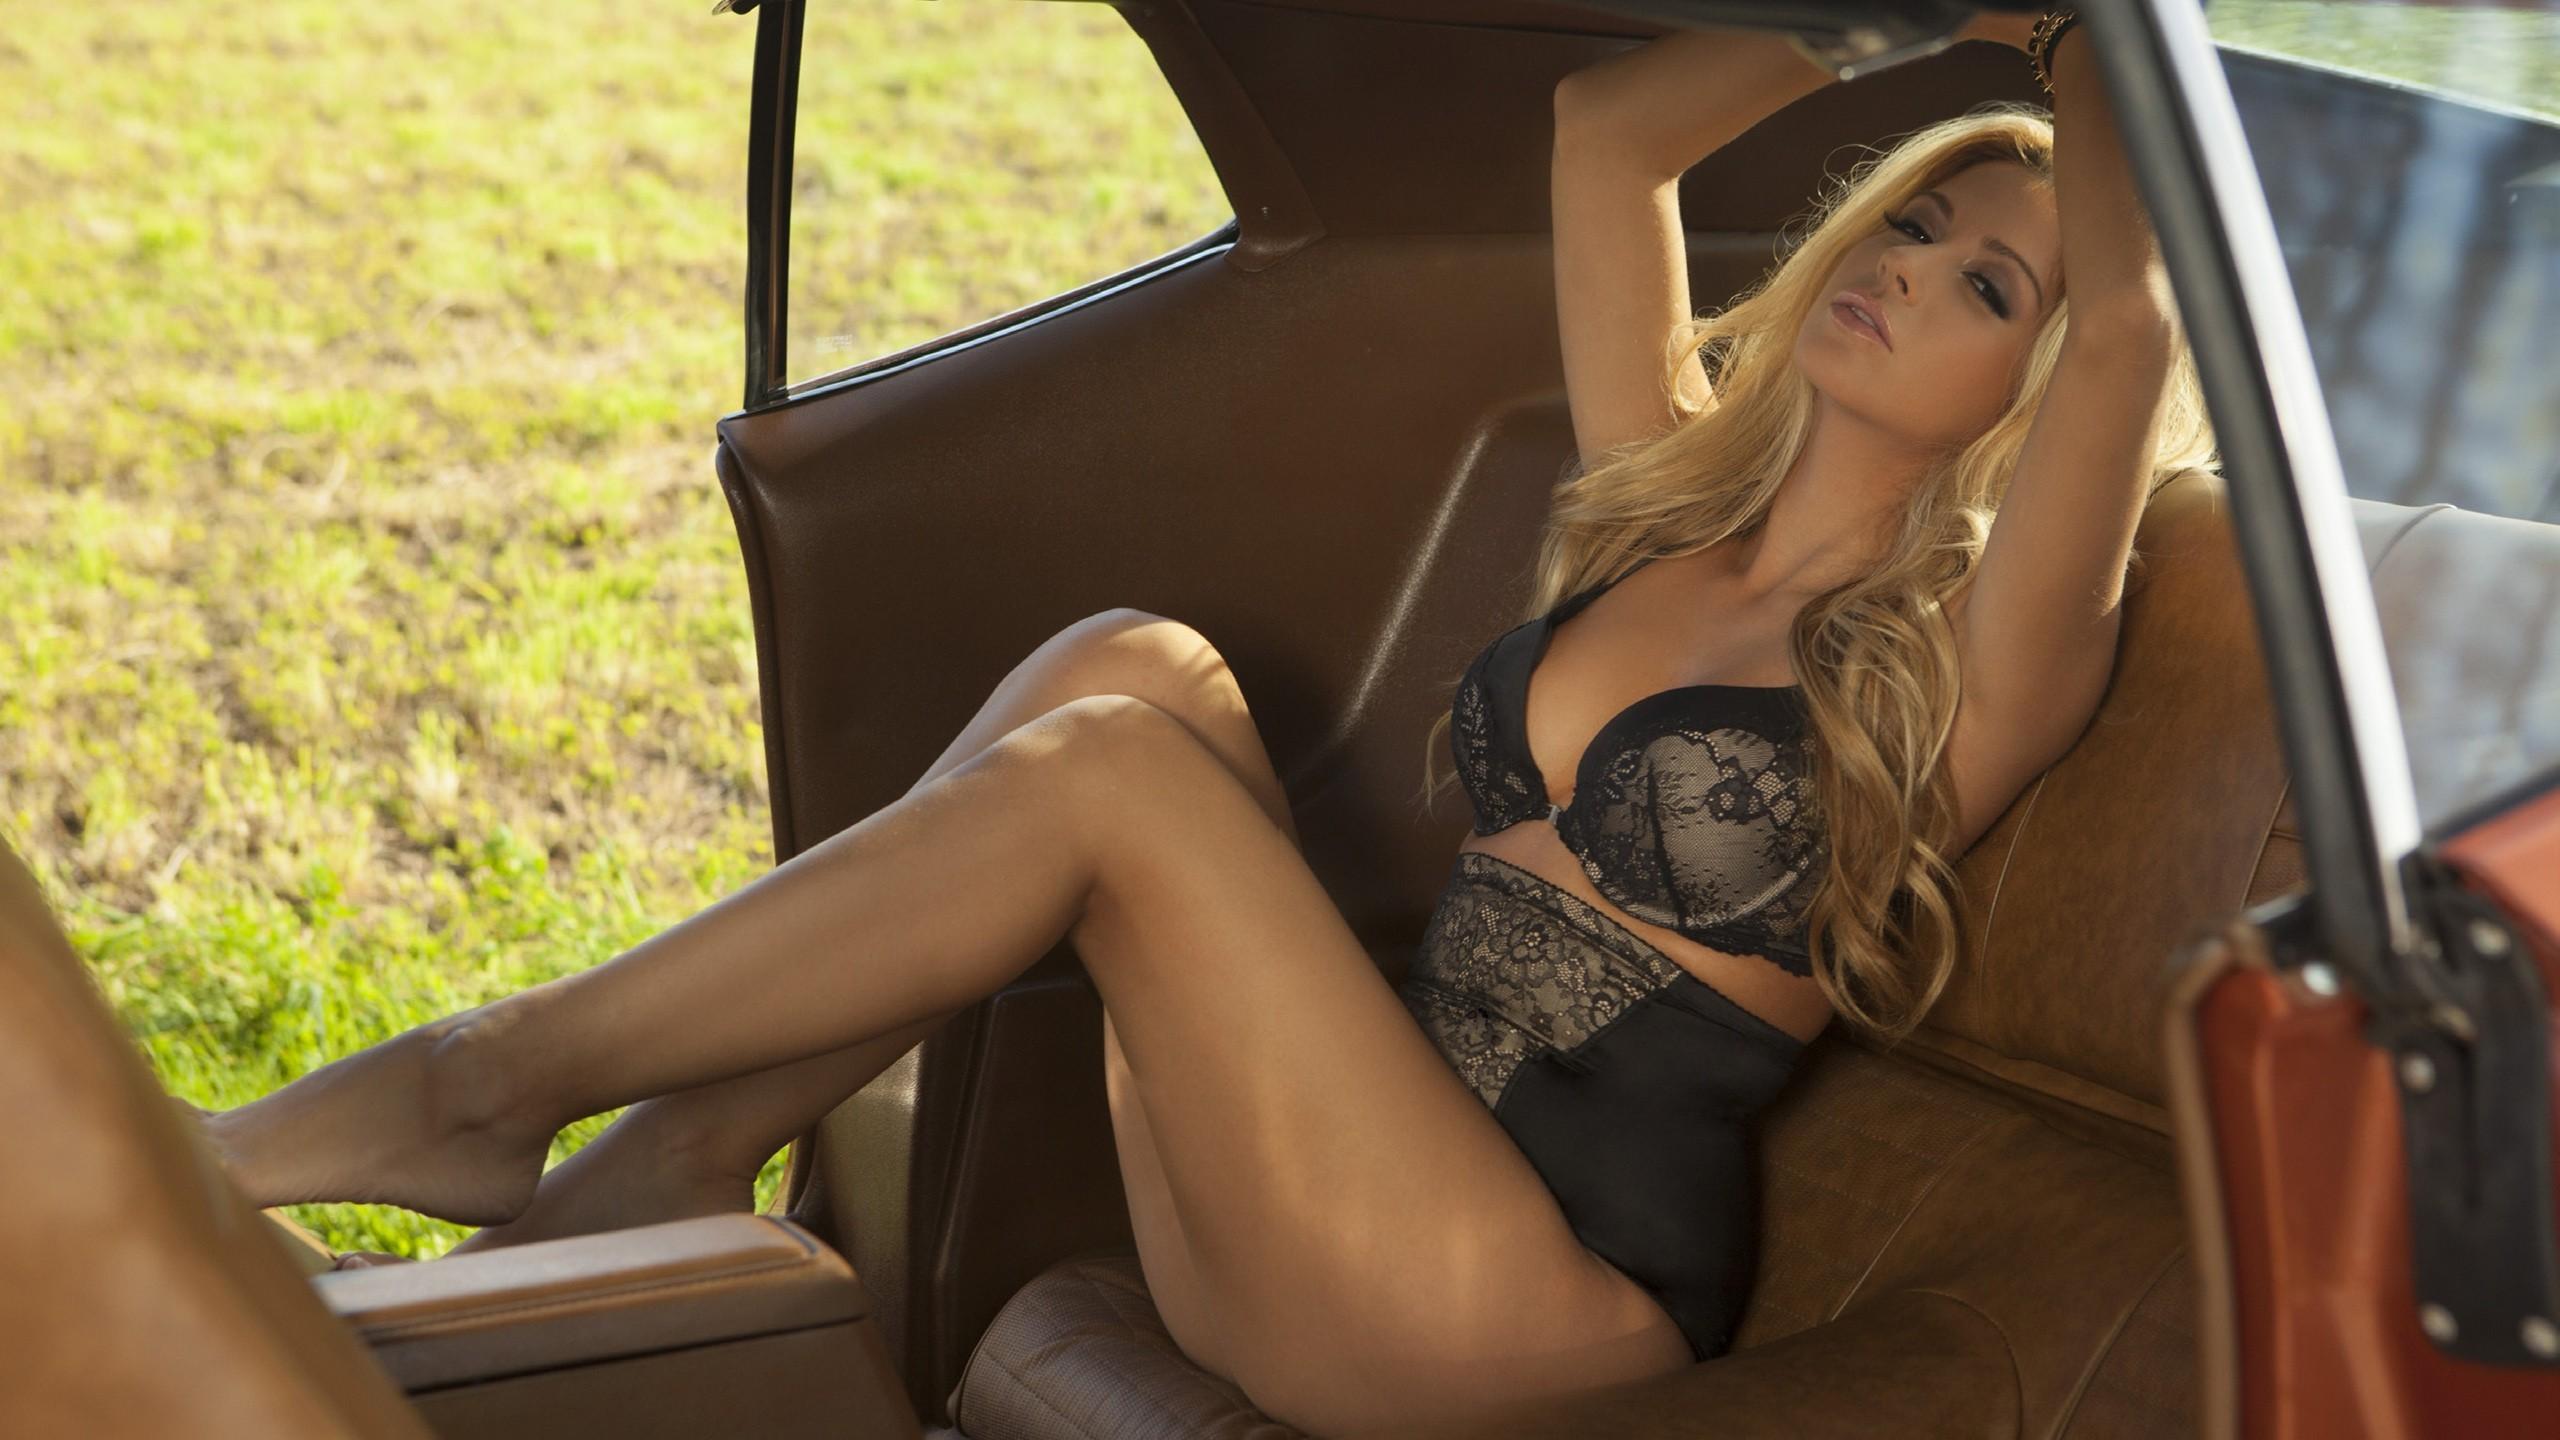 Wallpaper : blonde, long hair, legs, sitting, arms up, car ...